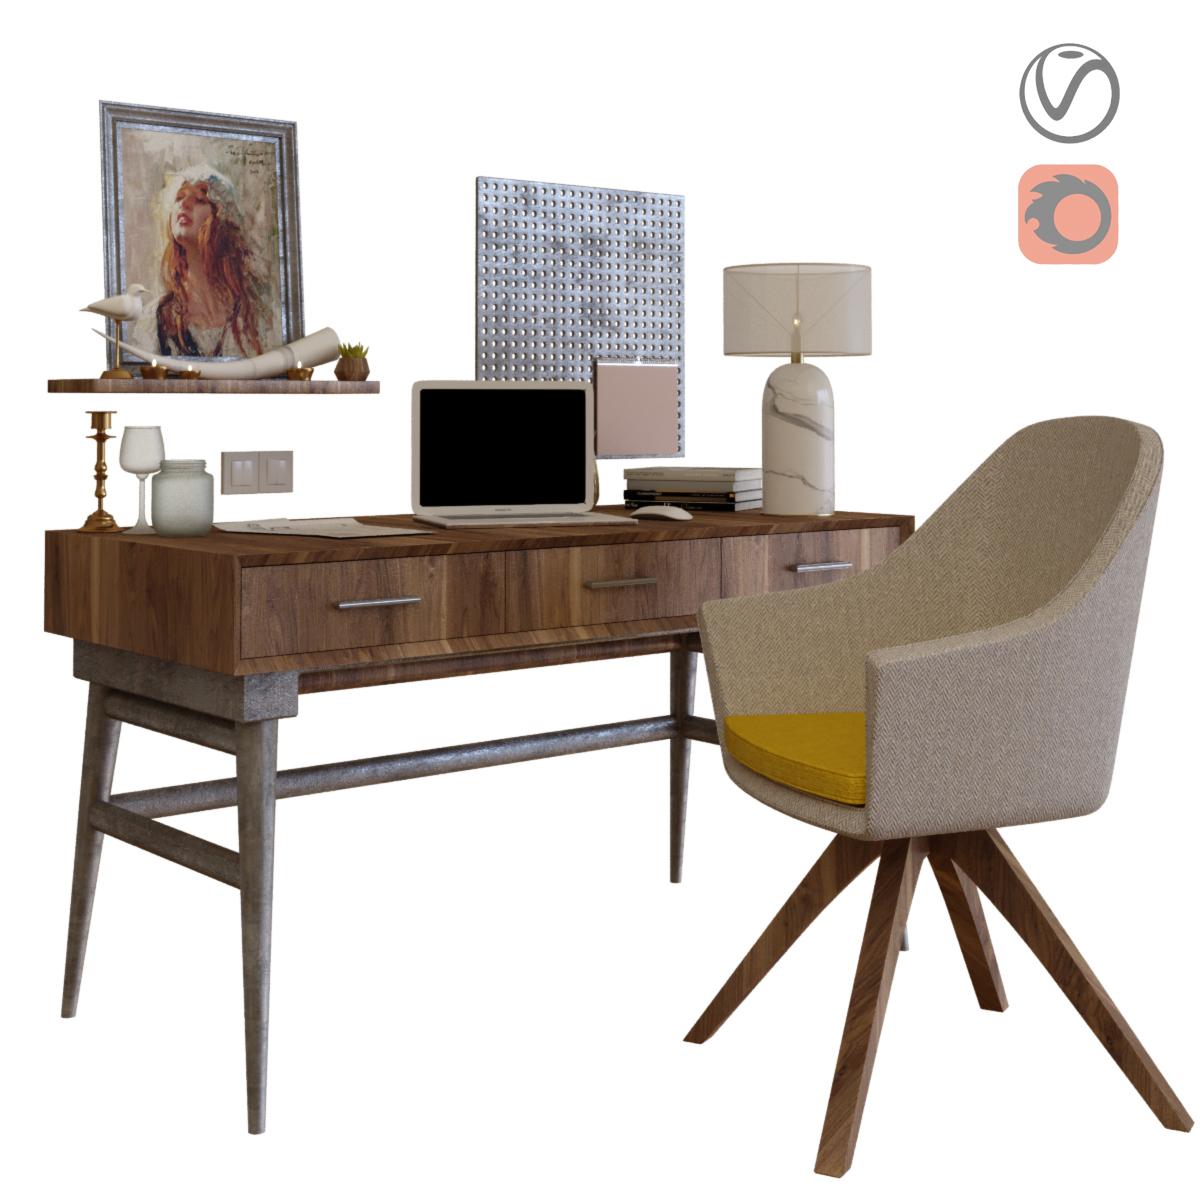 1.jpg Download STL file work table 3 • 3D printer design, unisjamavari